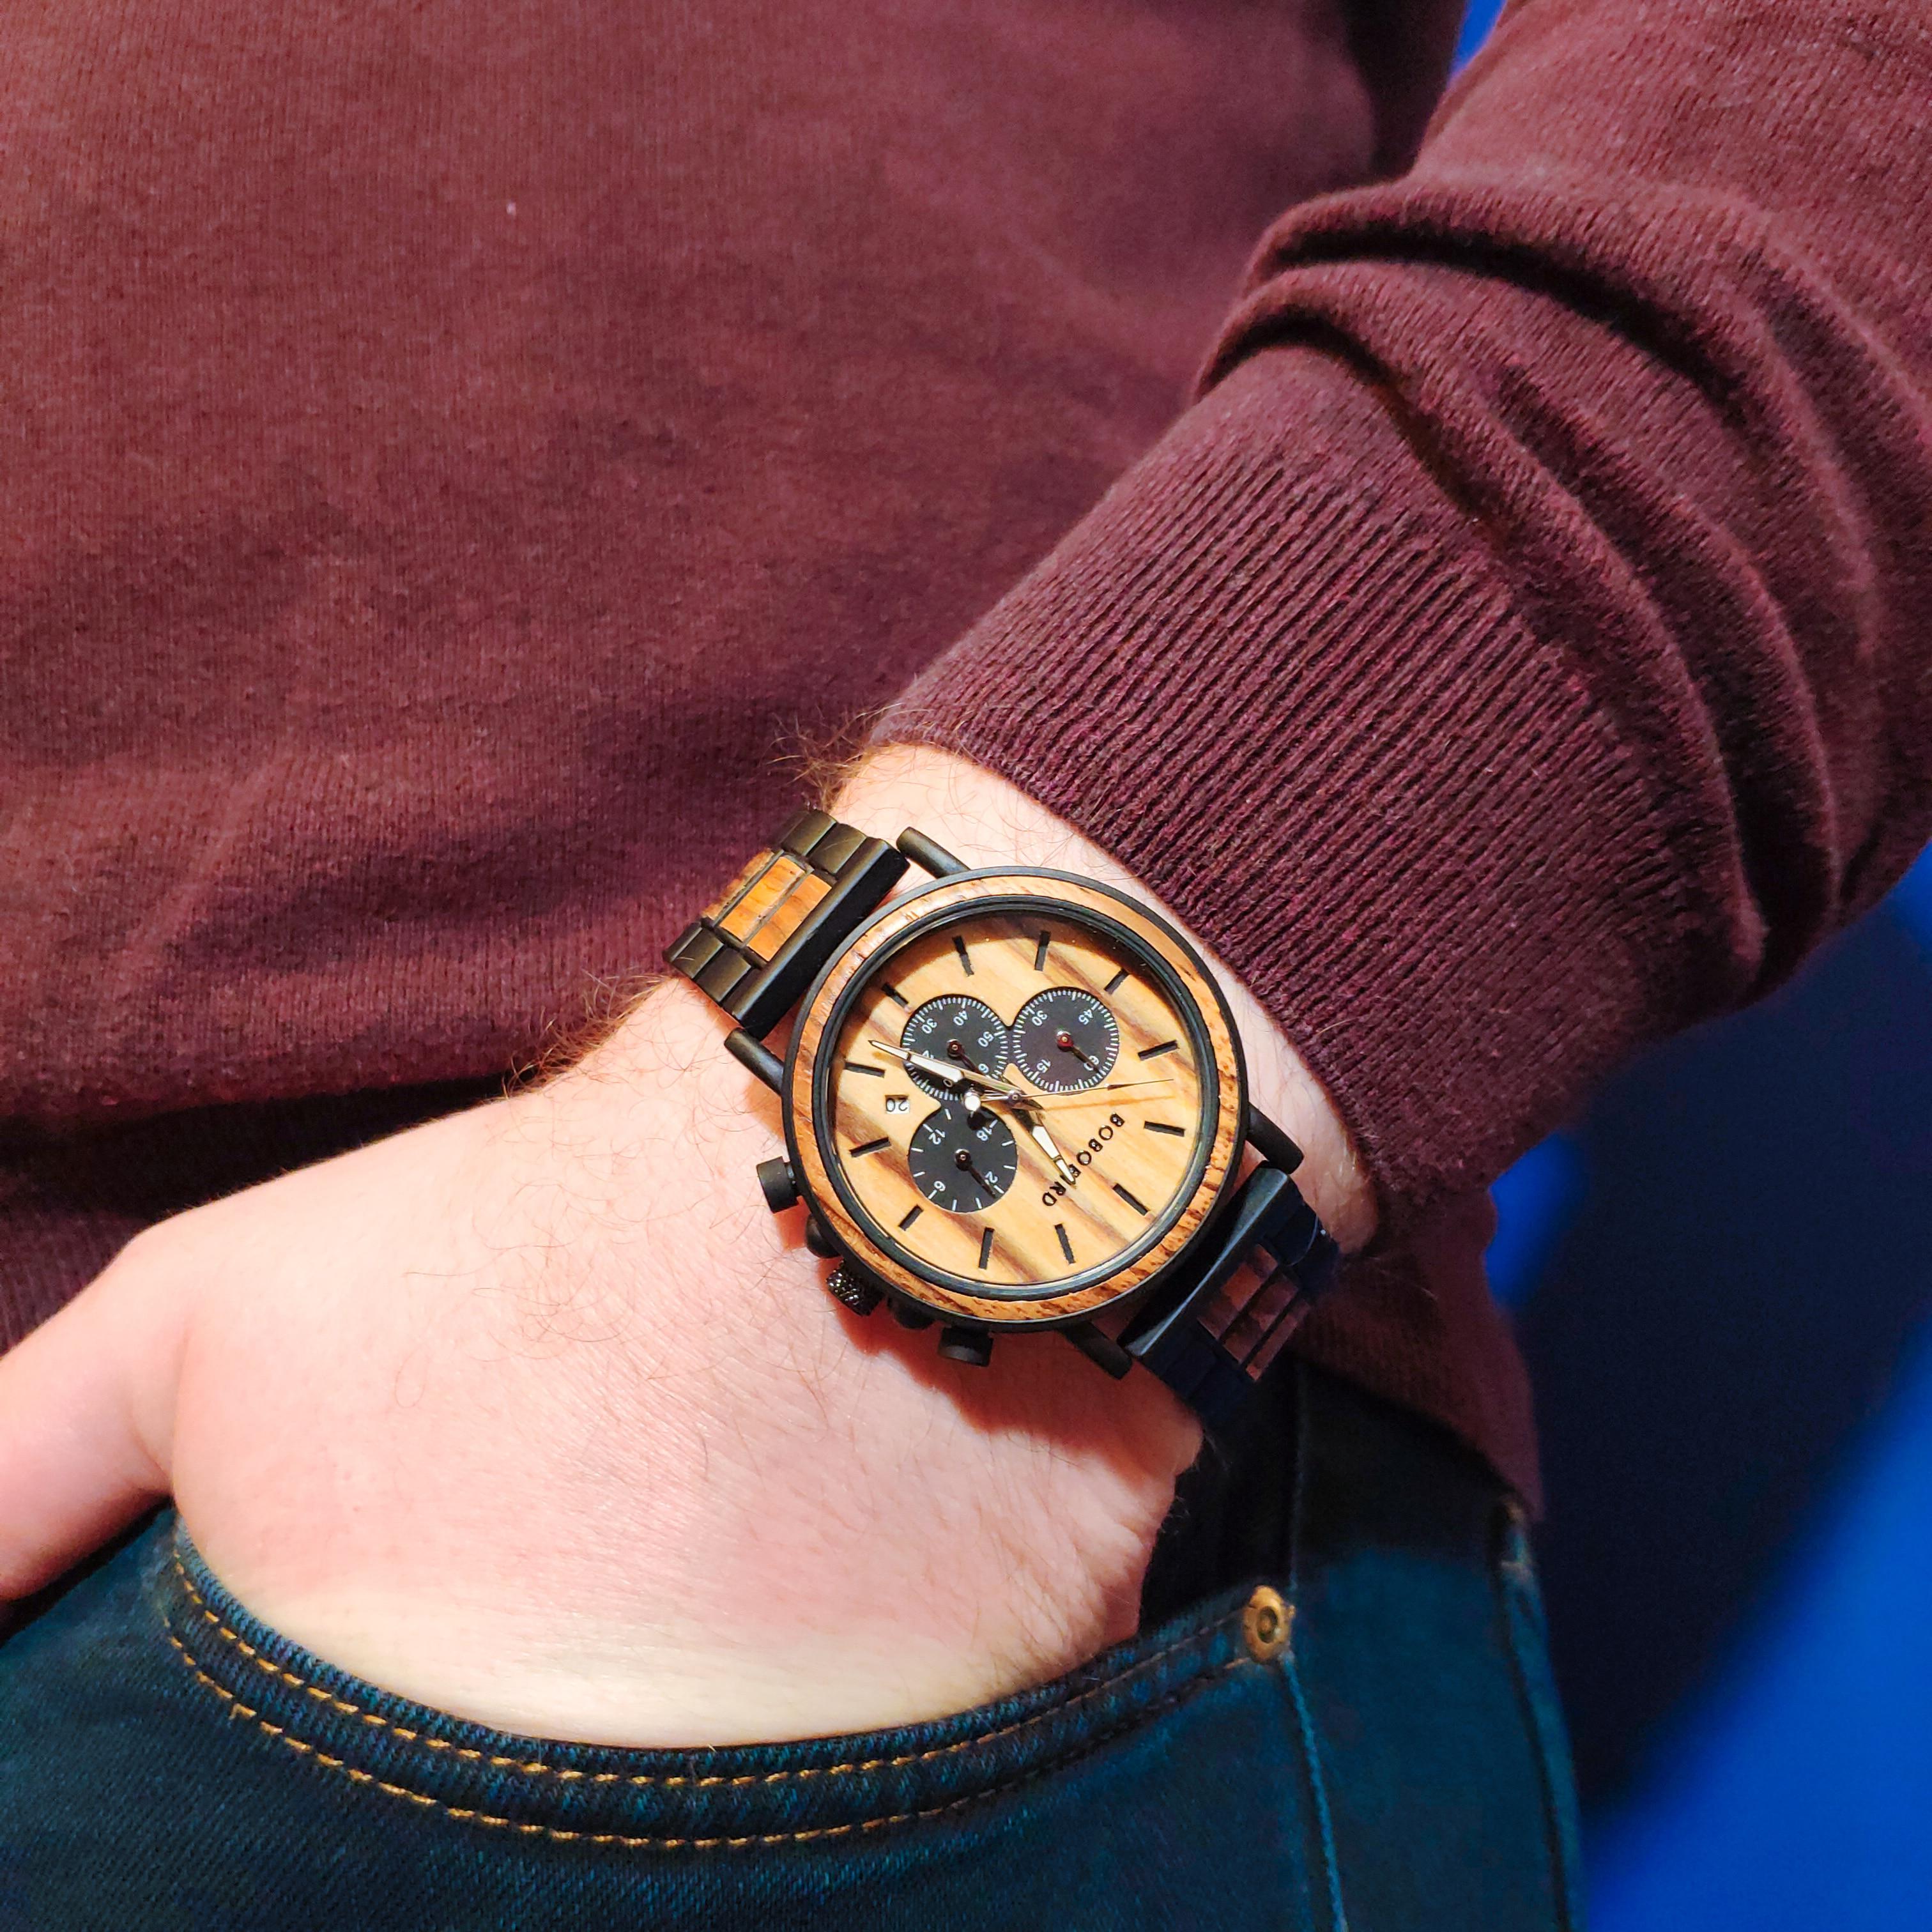 BOBO BIRD Wooden Watch Men erkek kol saati Luxury Stylish Wood Timepieces Chronograph Military Quartz Watches in Wood Gift Box 3